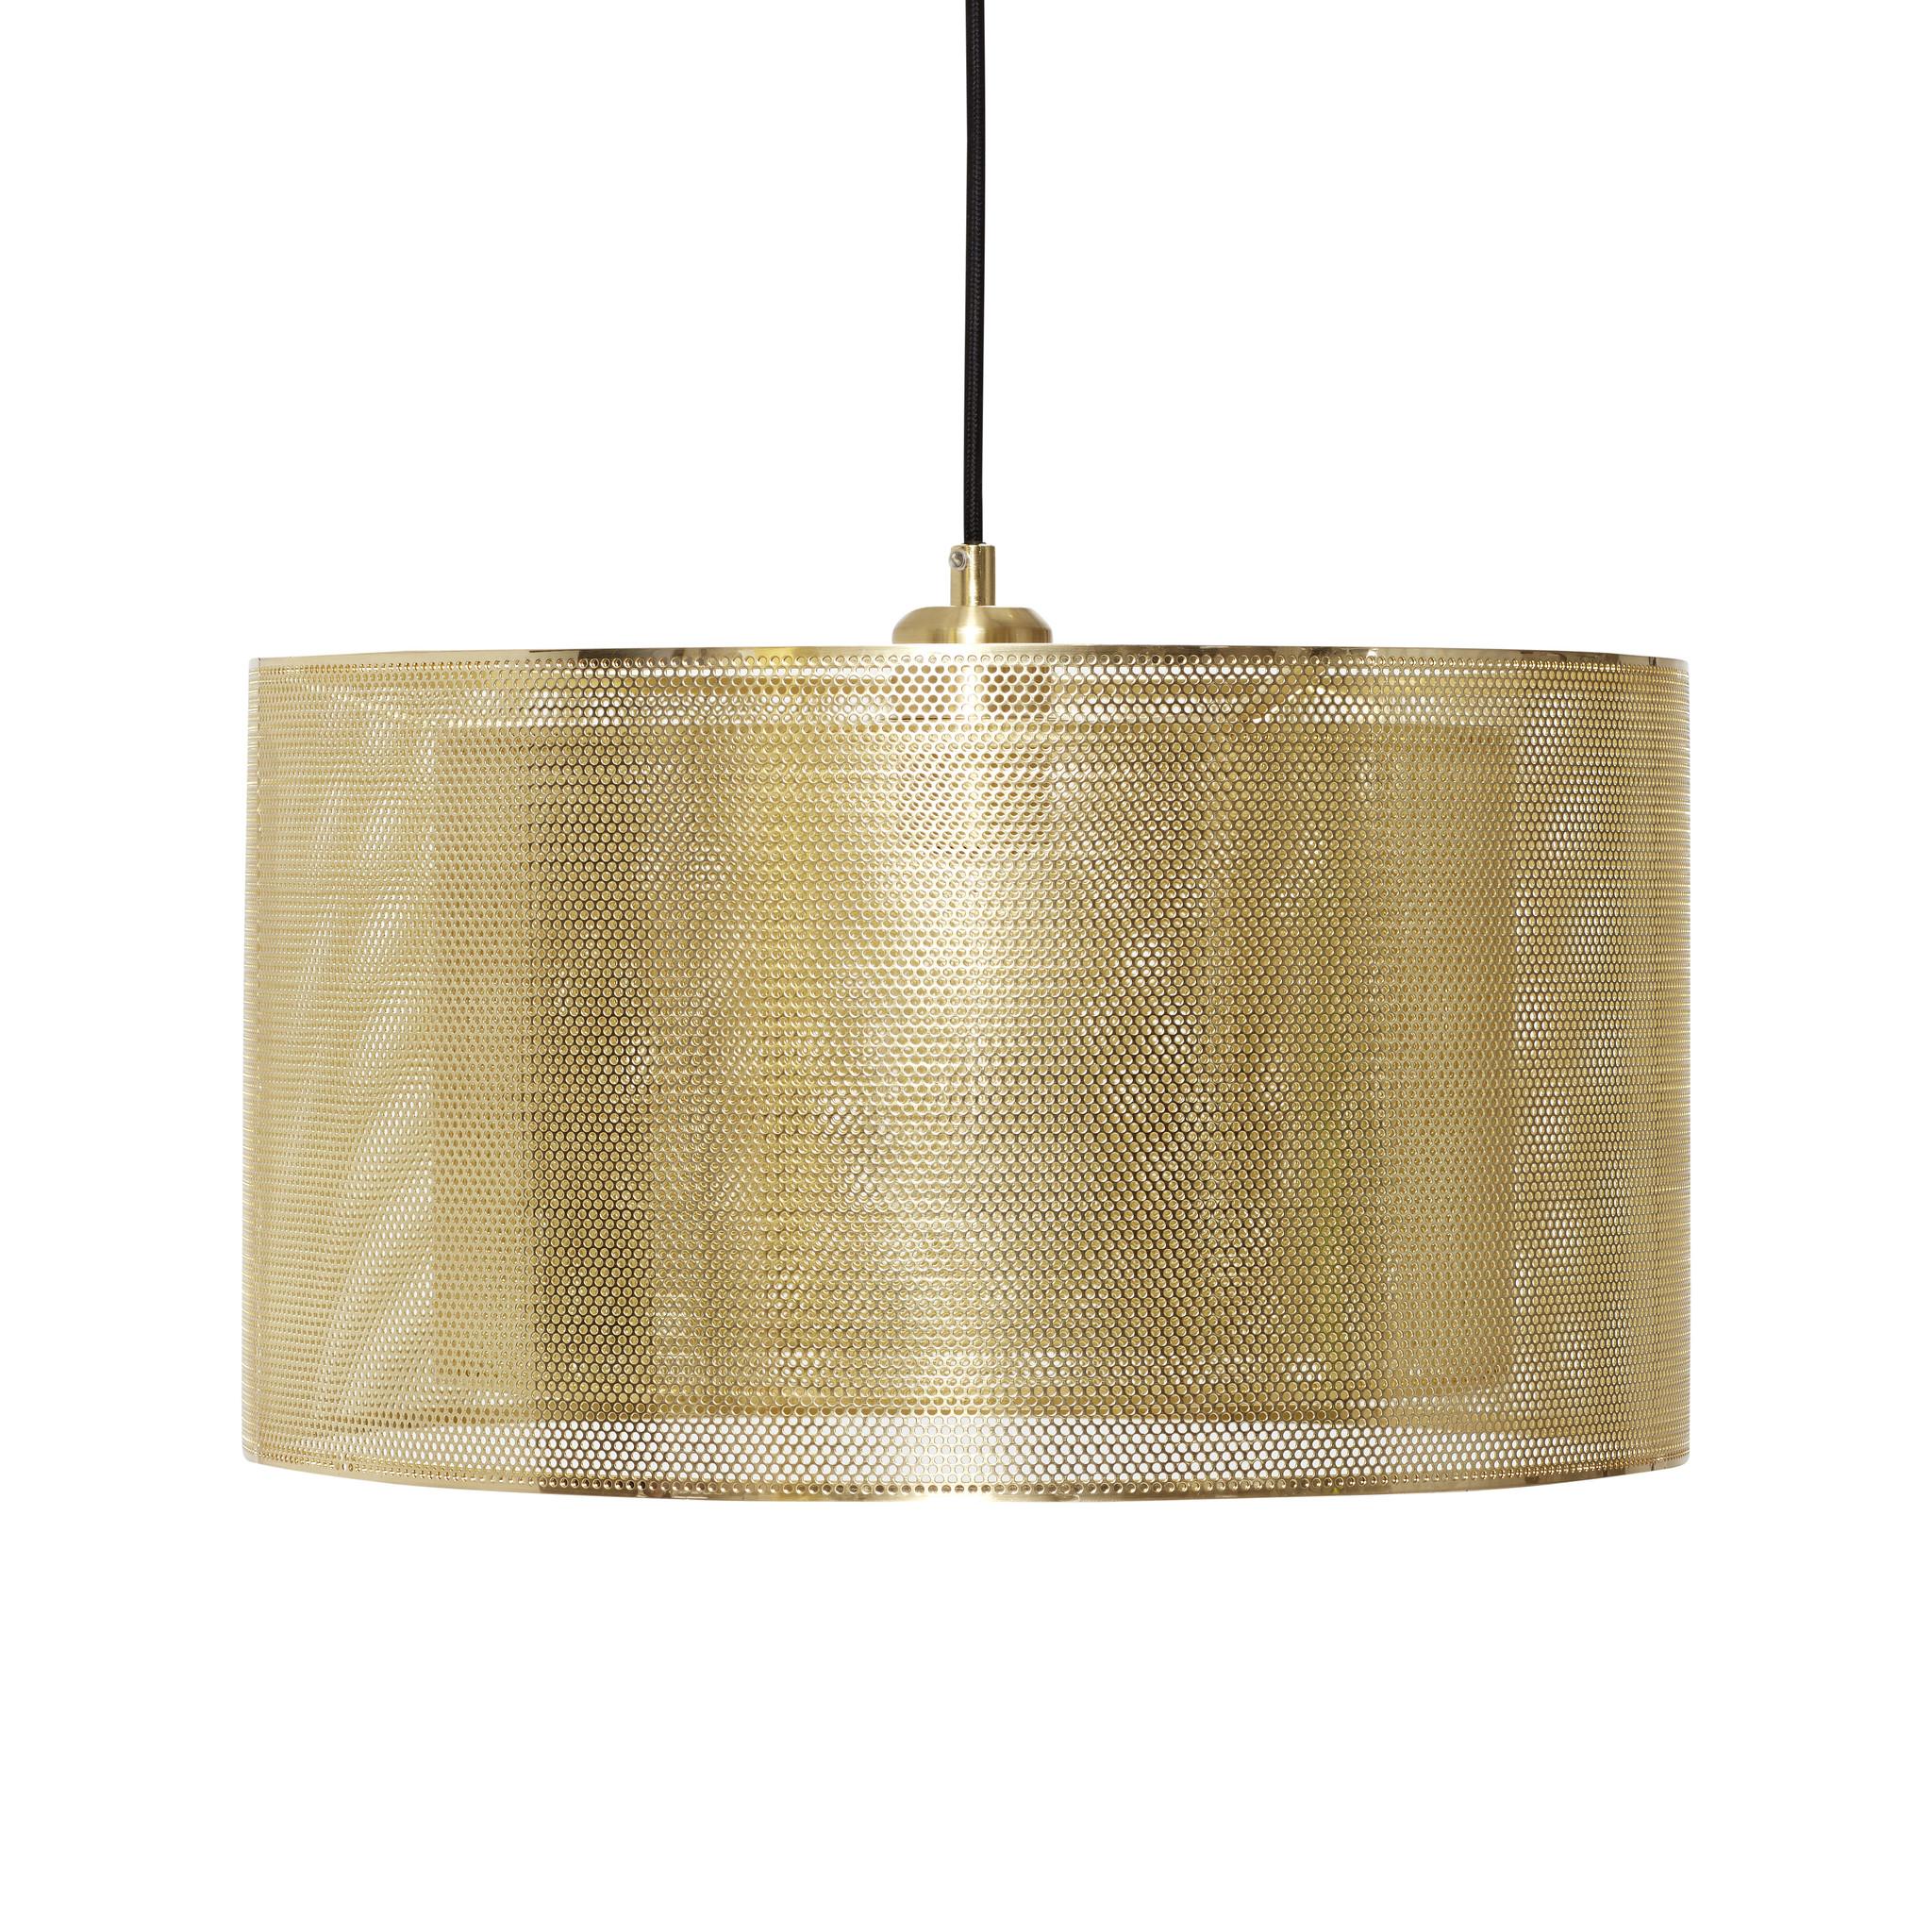 Hubsch Hanglamp ijzer messing/goud-990727-5712772067505